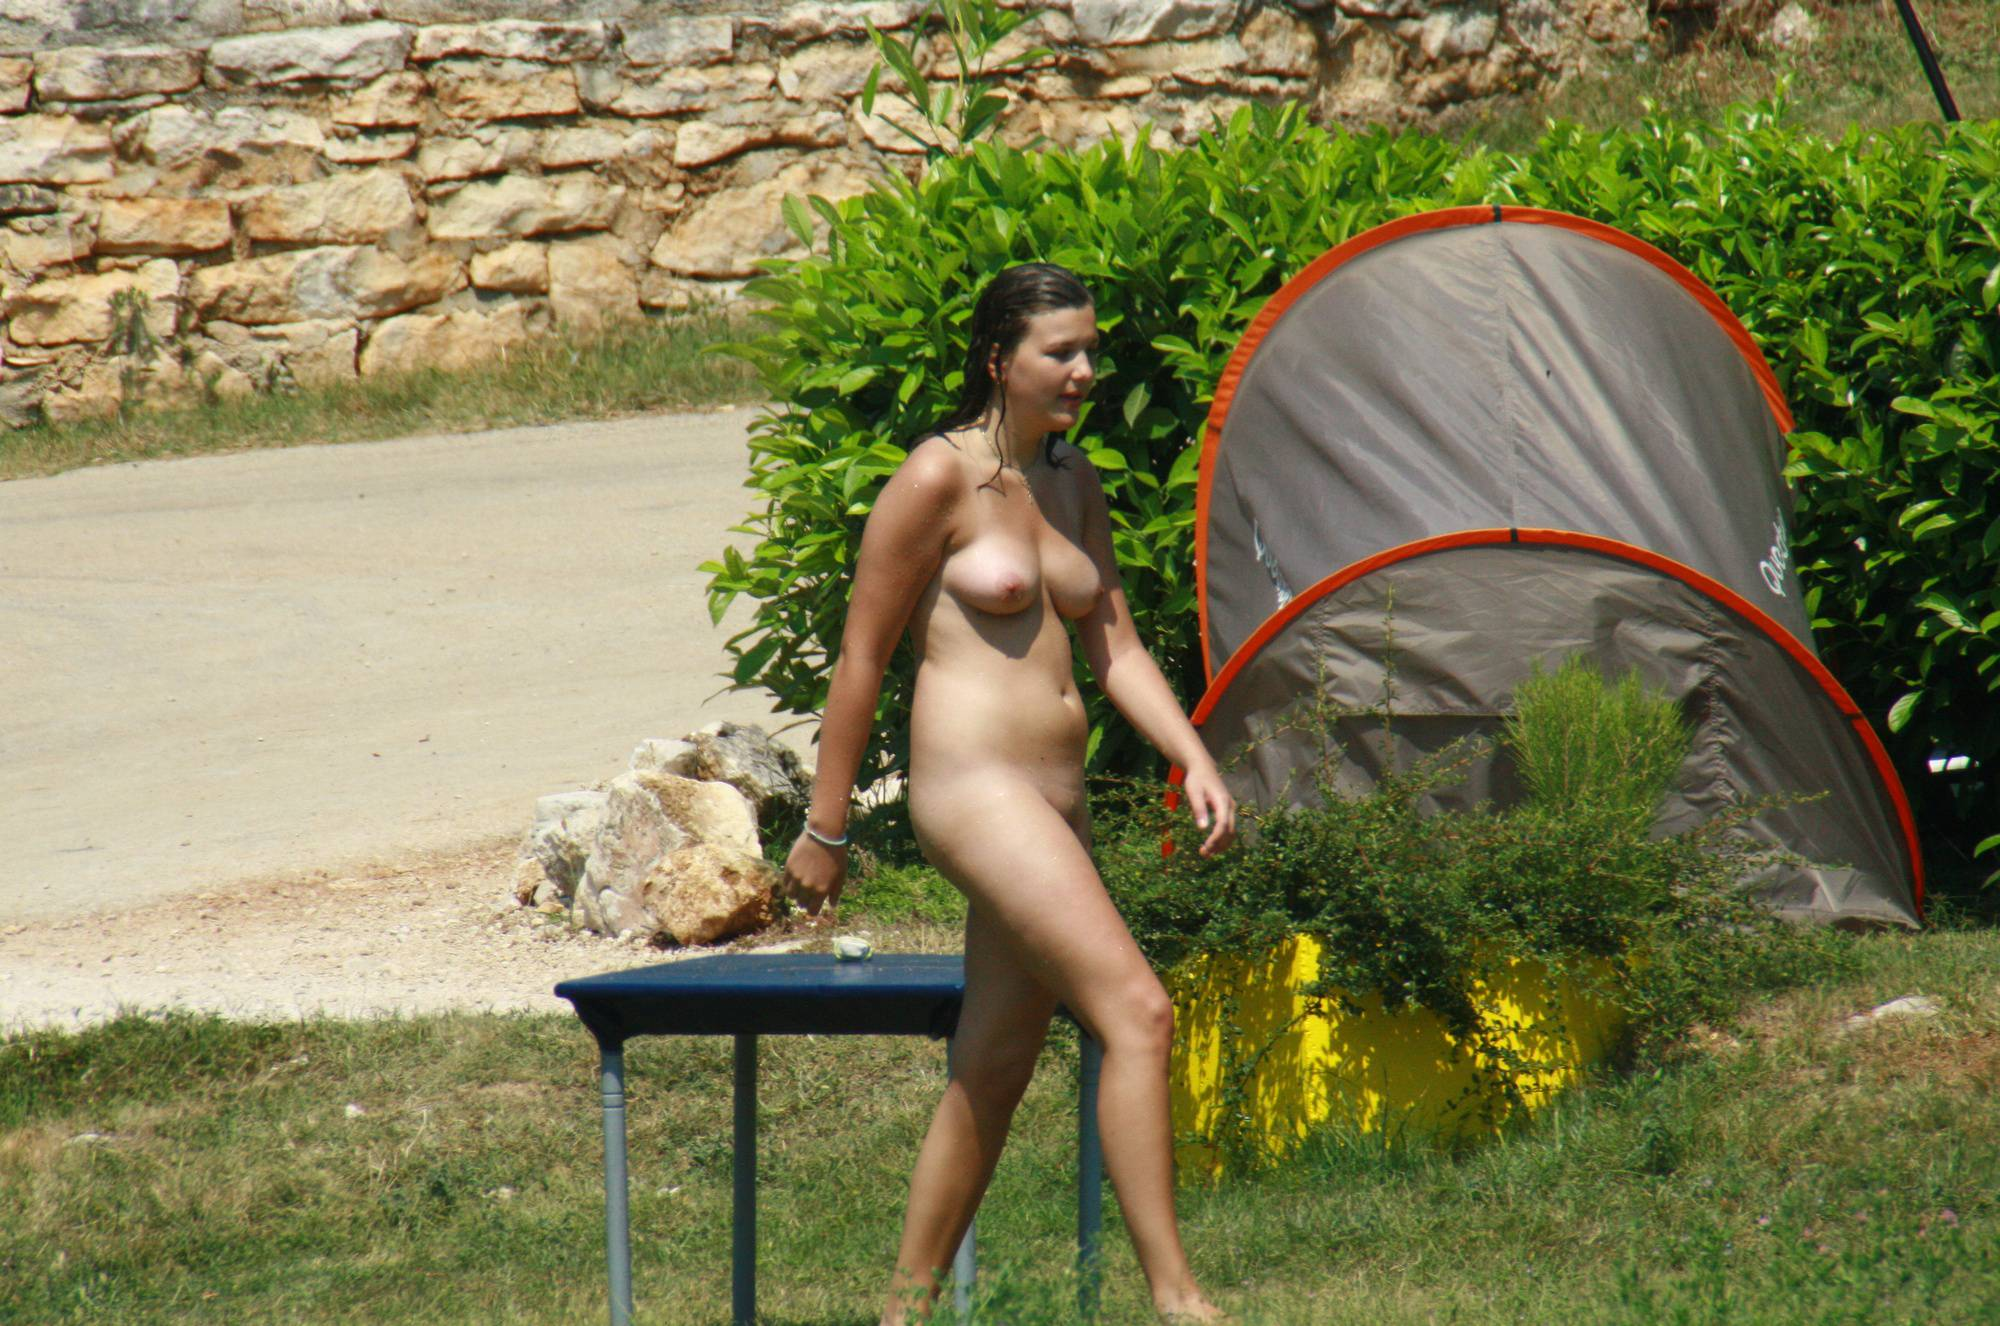 Red-Headed Nudist Couple - 2